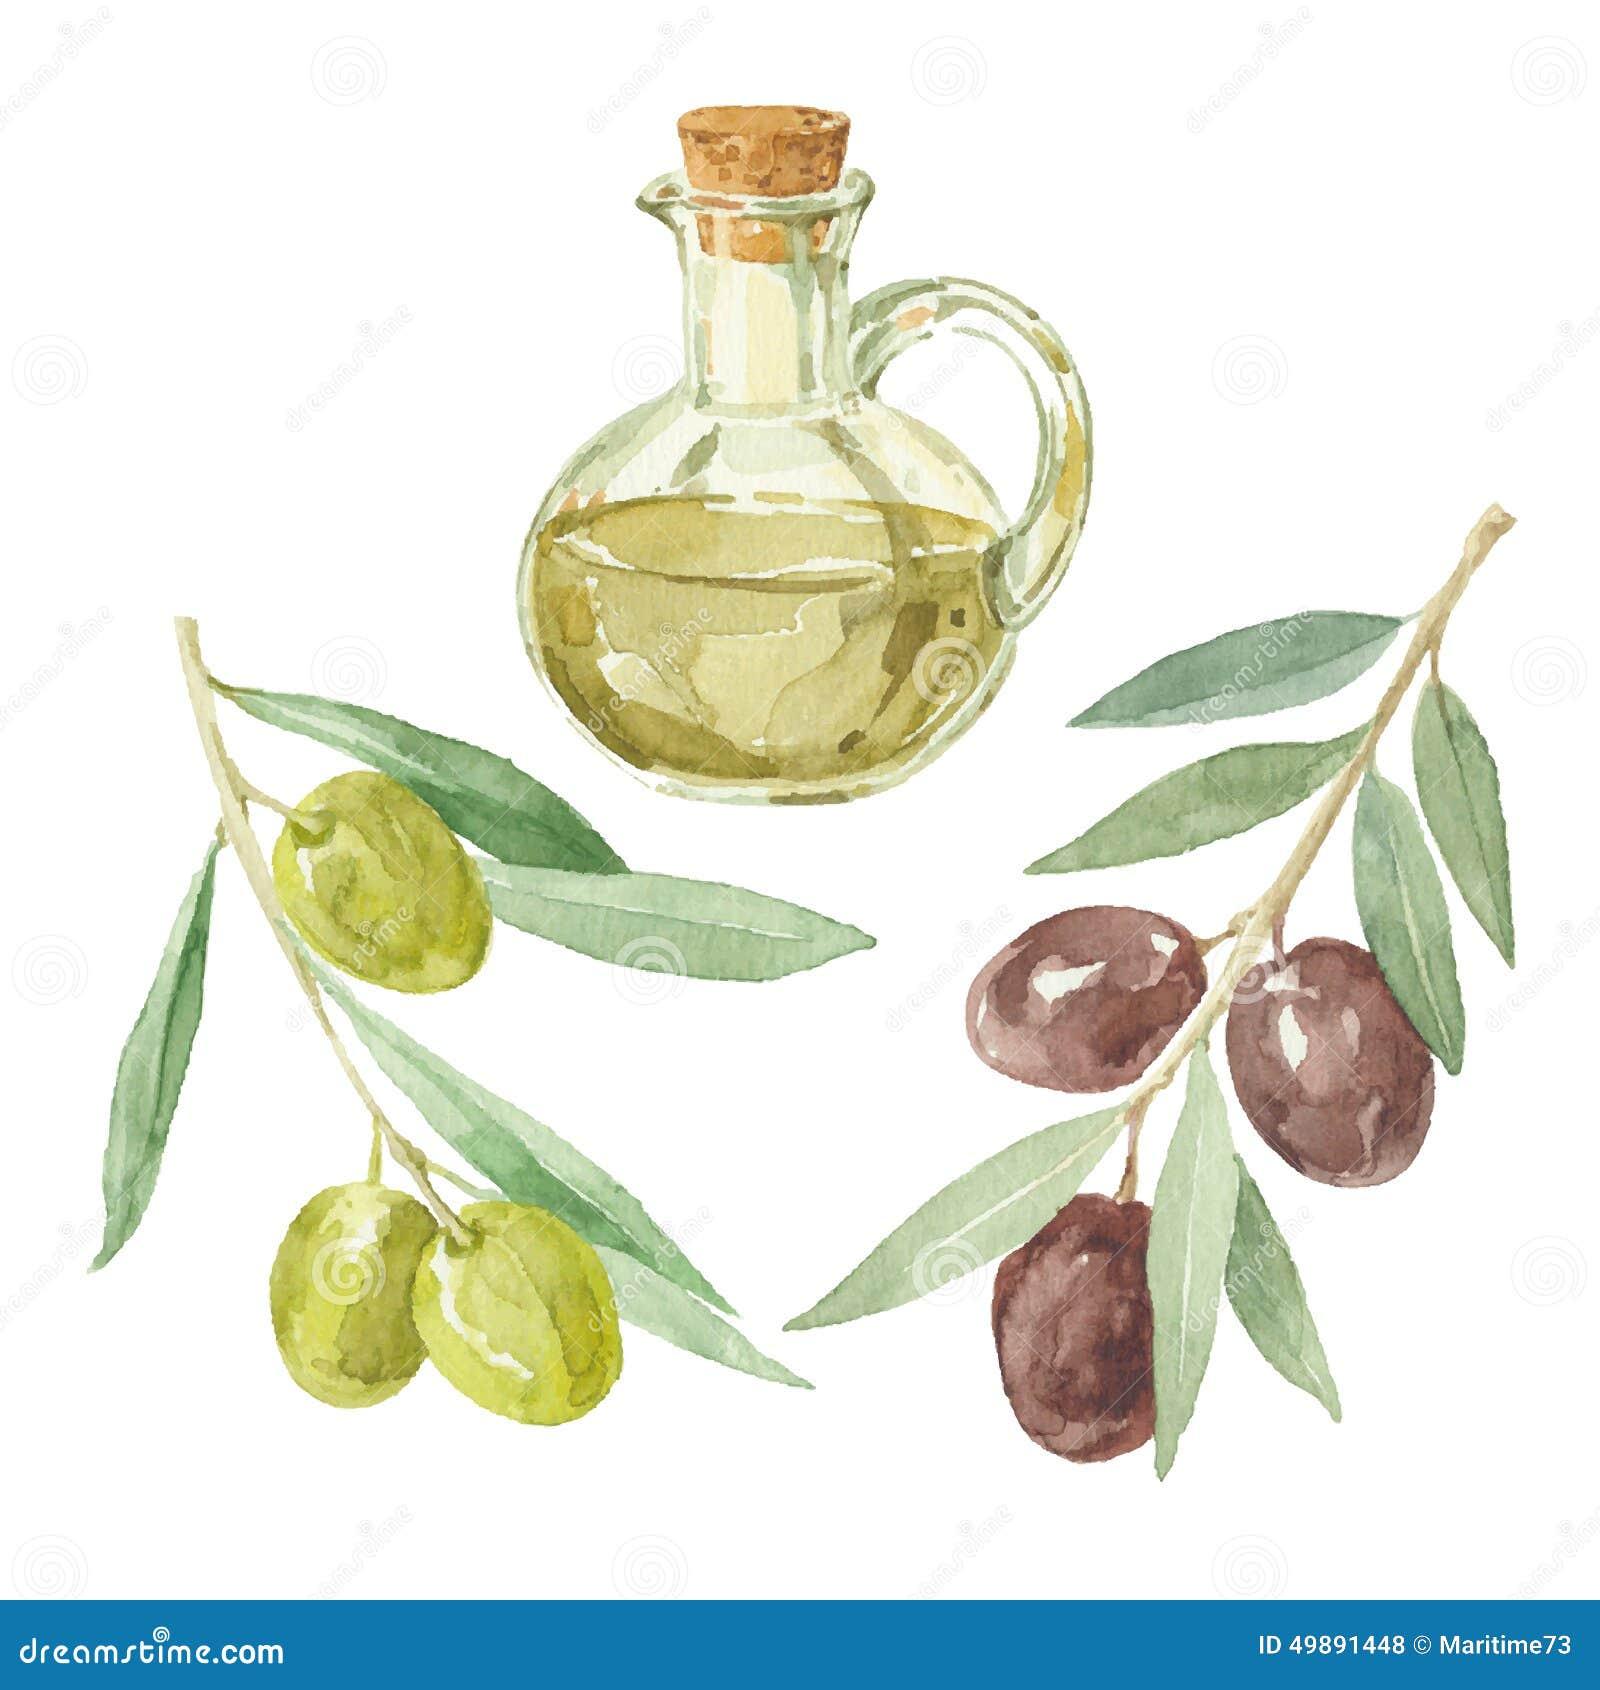 branches d 39 olivier et une bouteille du dessin d 39 huile d 39 olive par l 39 aquarelle illustration stock. Black Bedroom Furniture Sets. Home Design Ideas